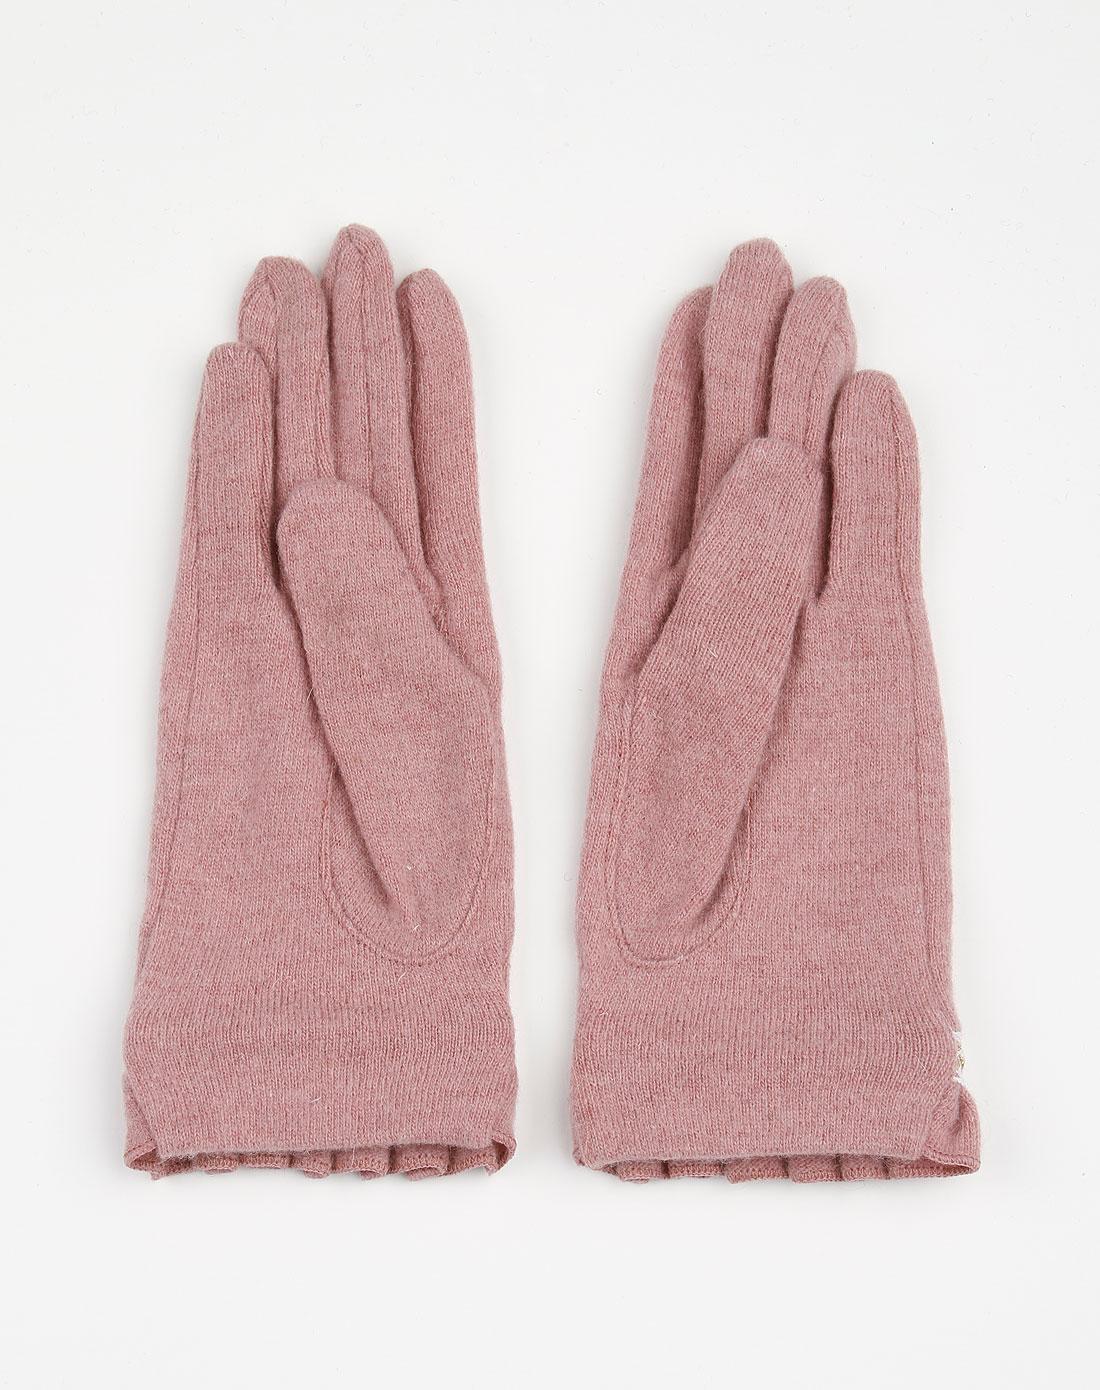 fenseb_b&balos-暗粉色简约手套